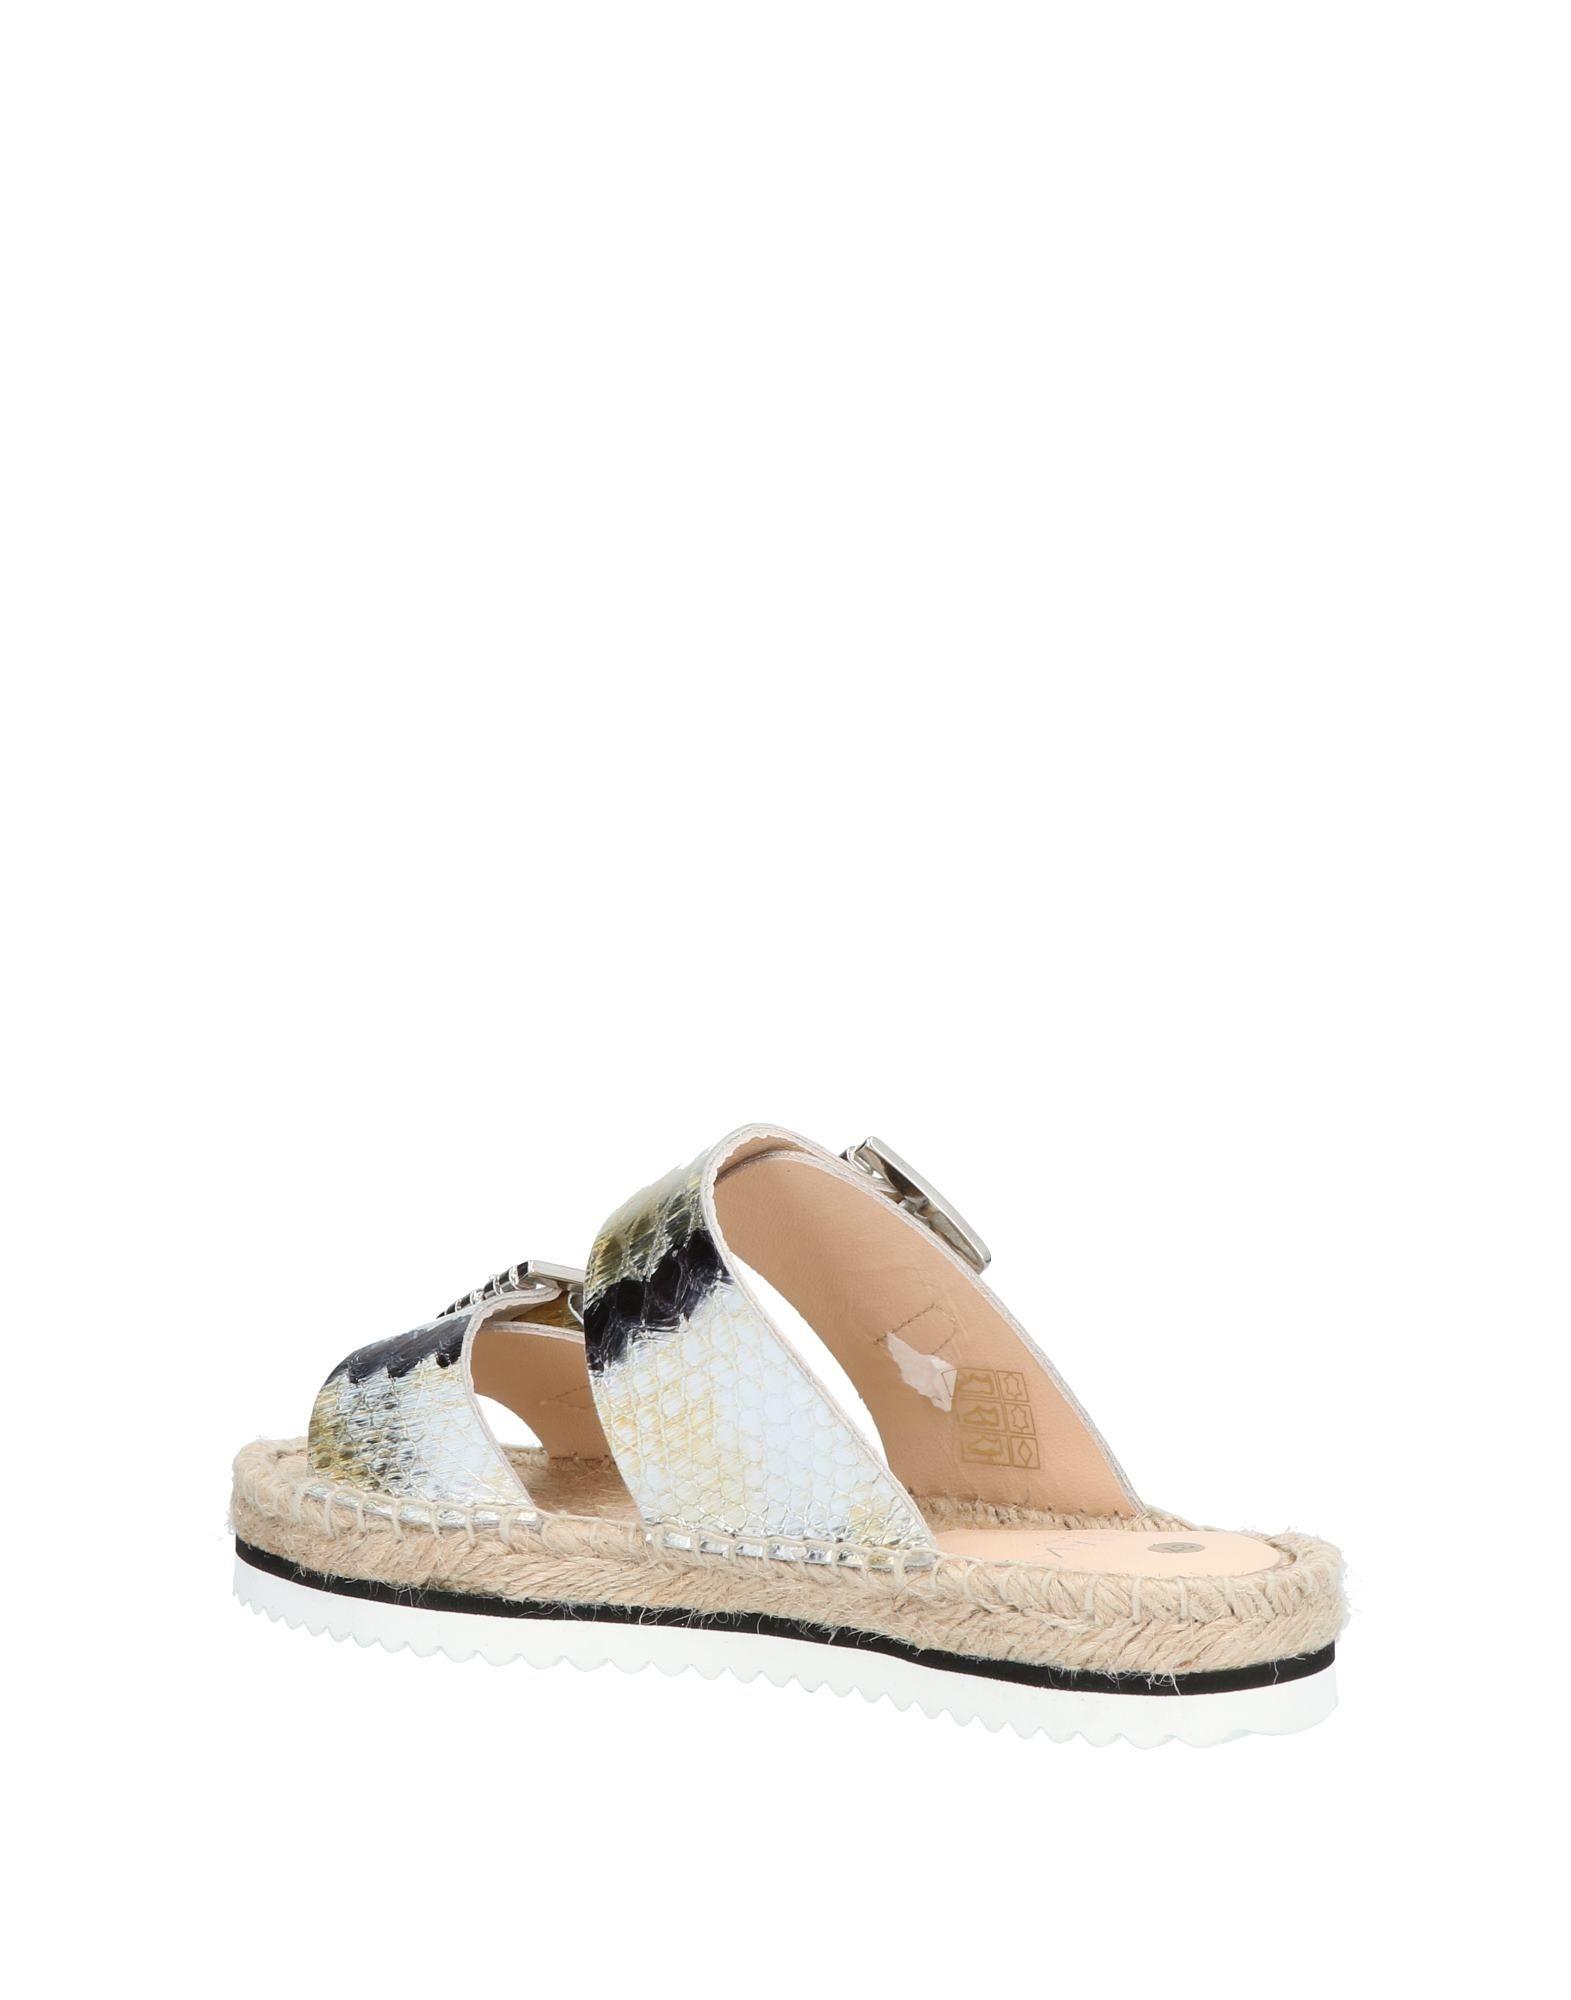 Sandales Anaki Femme - Sandales Anaki sur